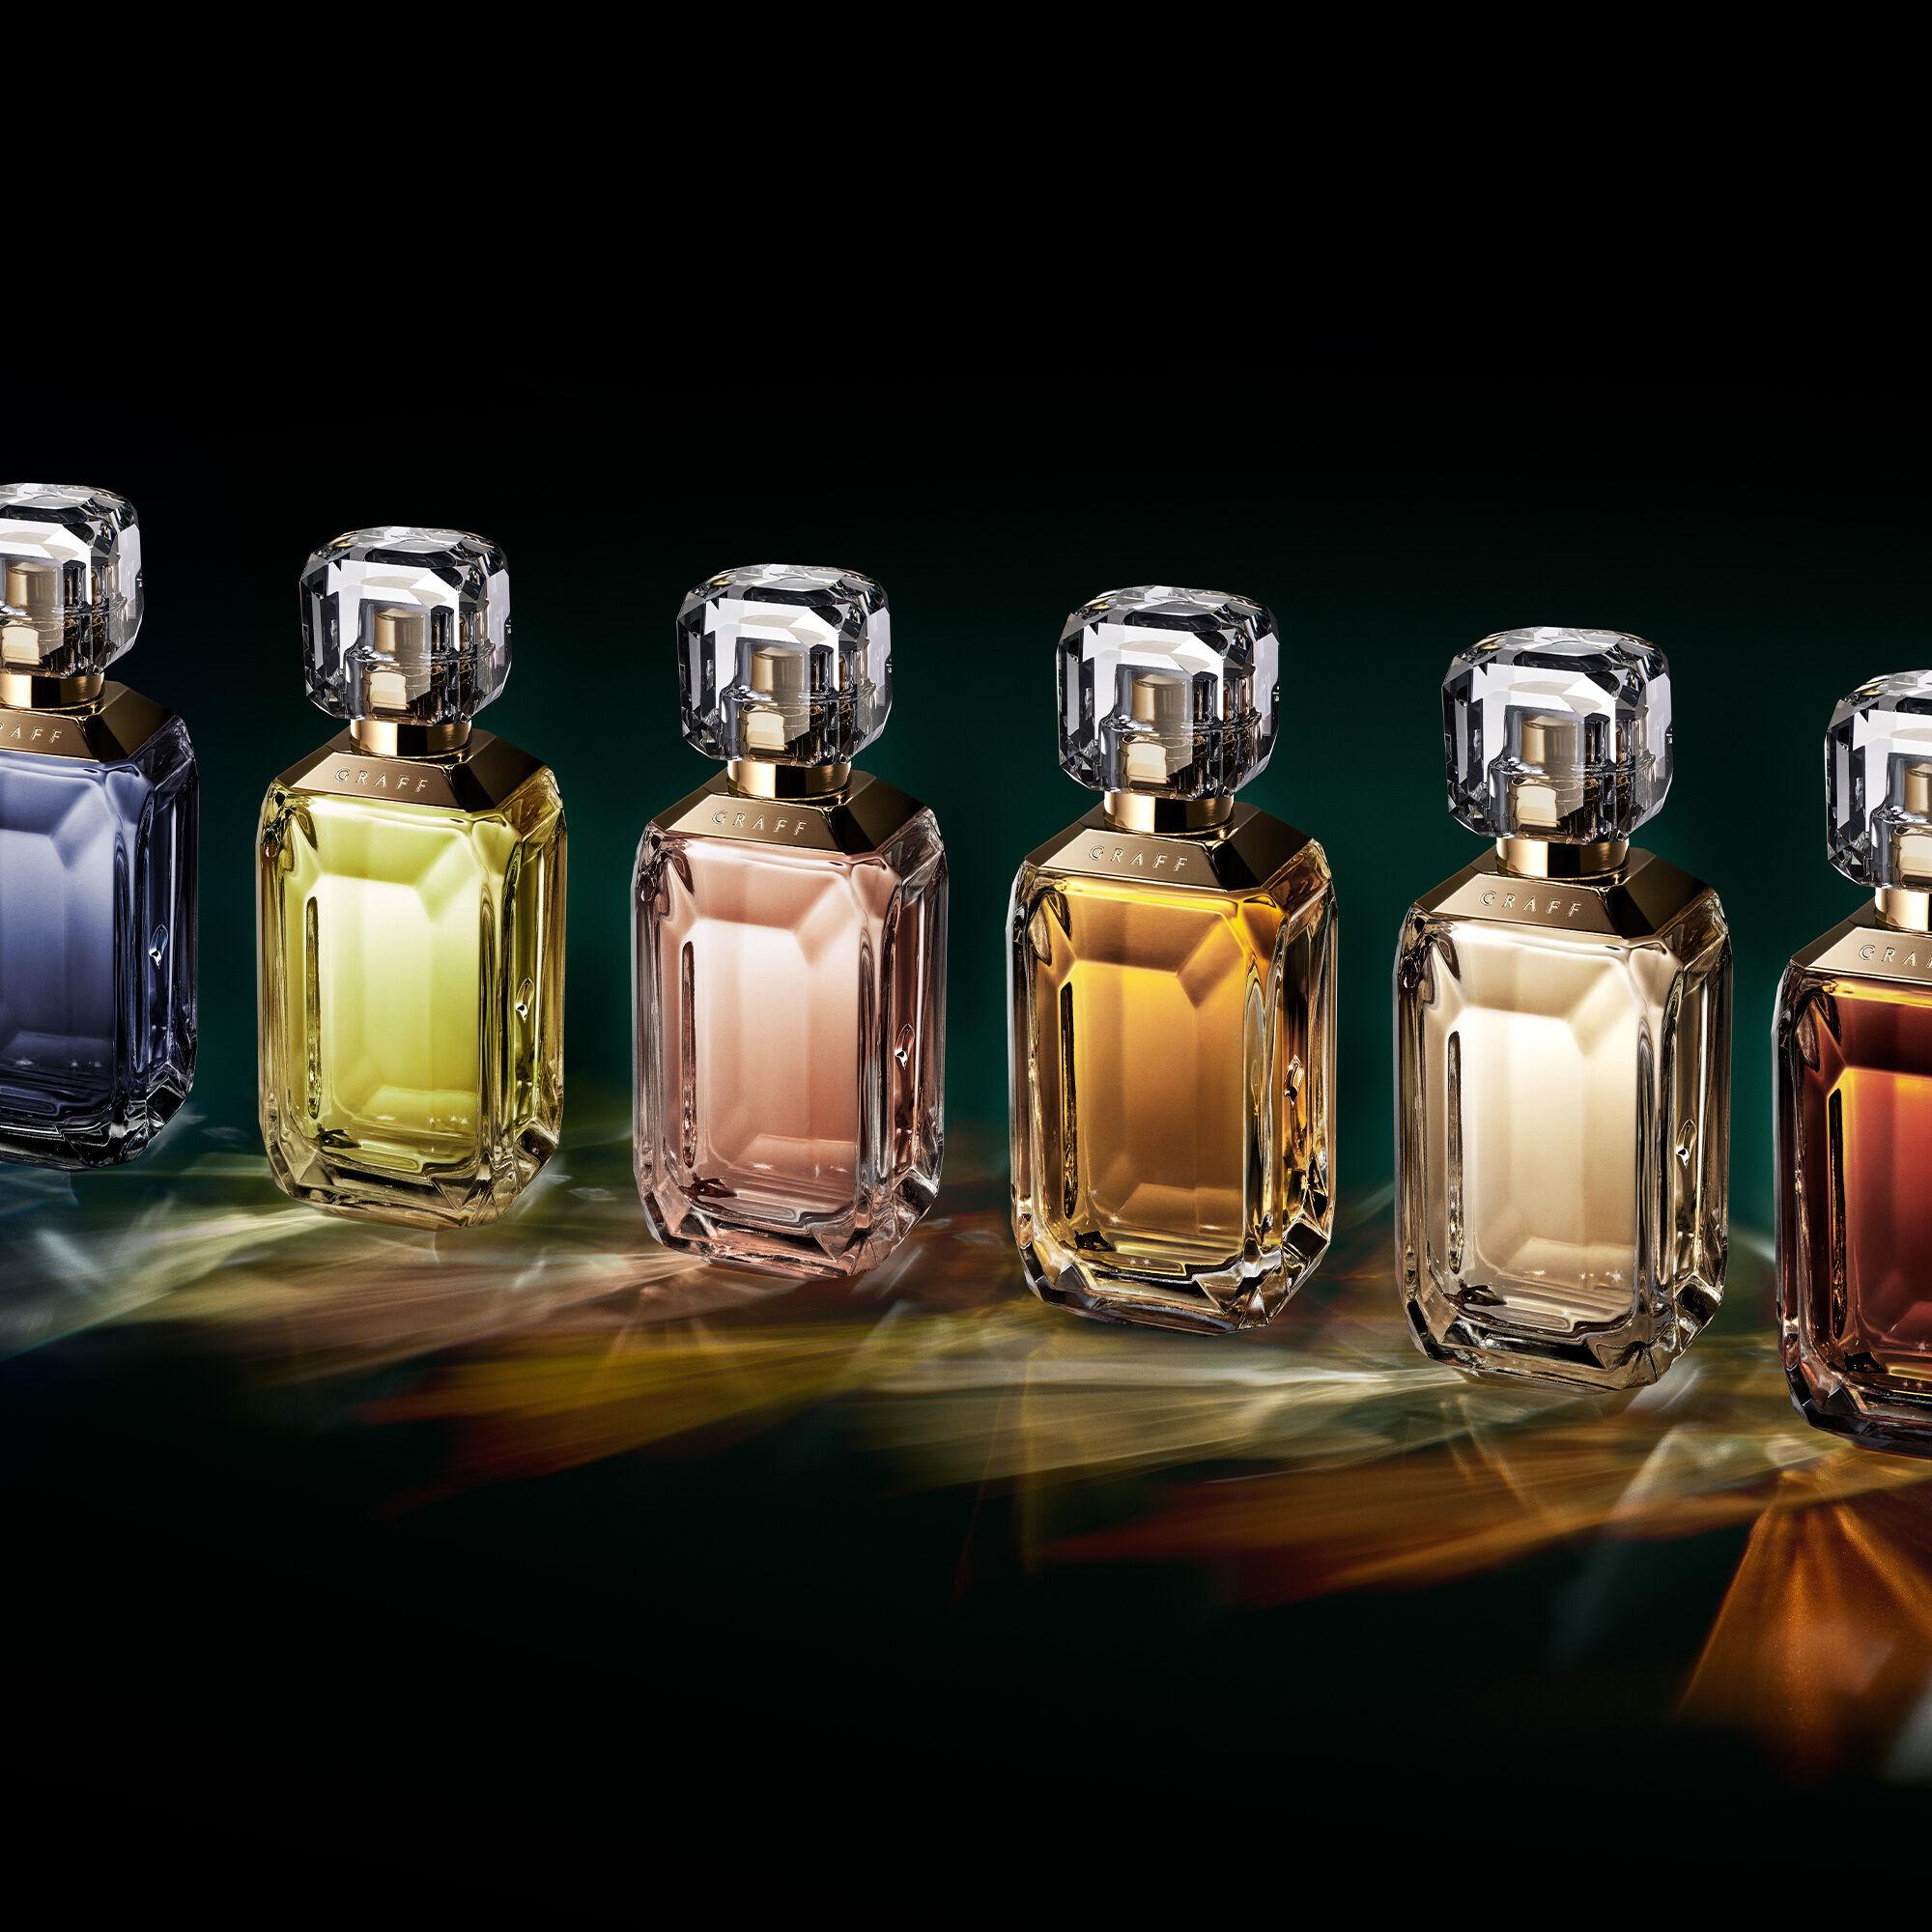 Six bottles of the Graff Lesedi La Rona Fragrance